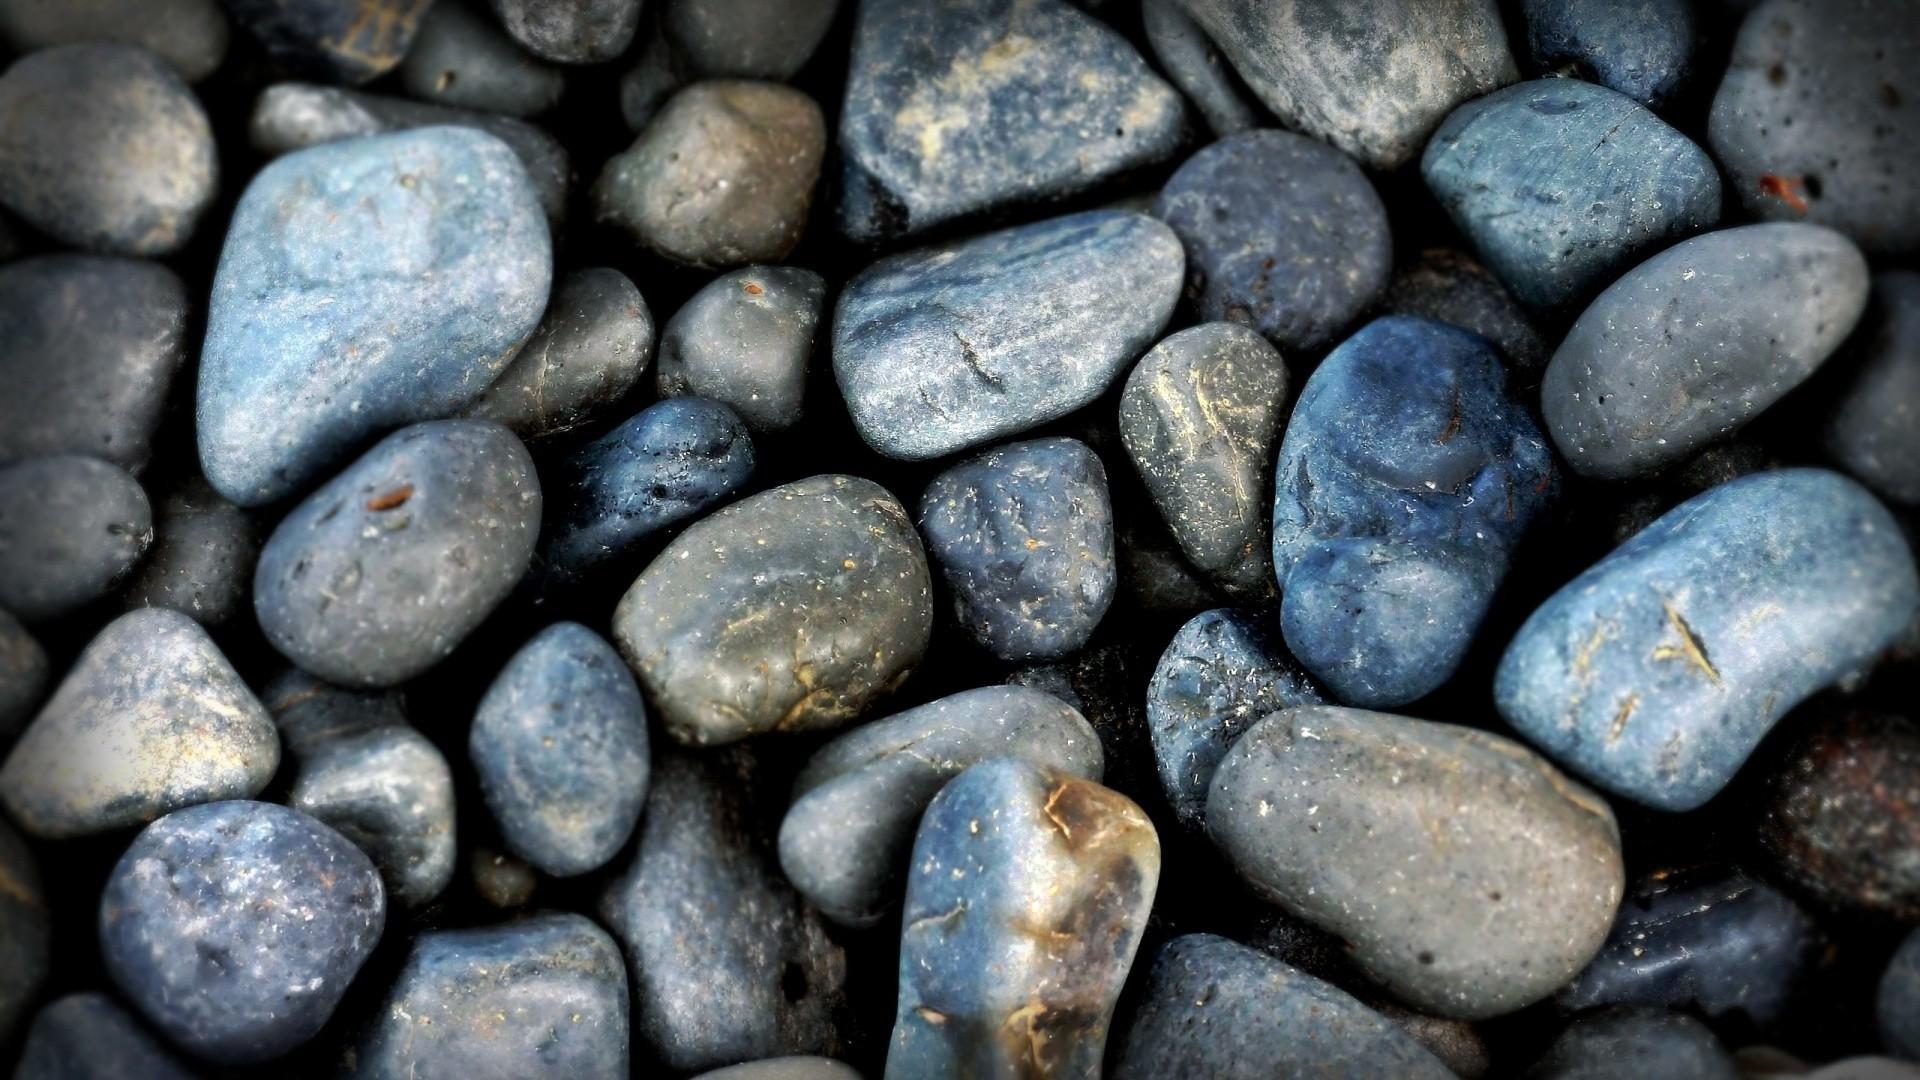 Stones Picture